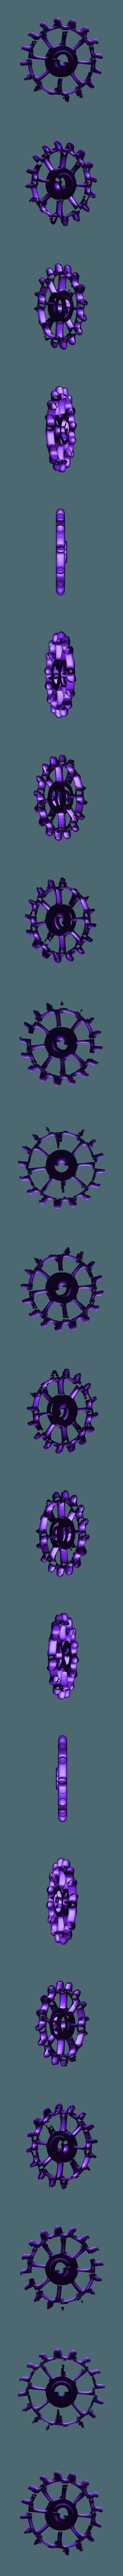 rouage.stl Download free STL file Gearing (gearing) • 3D printing design, Techmaker